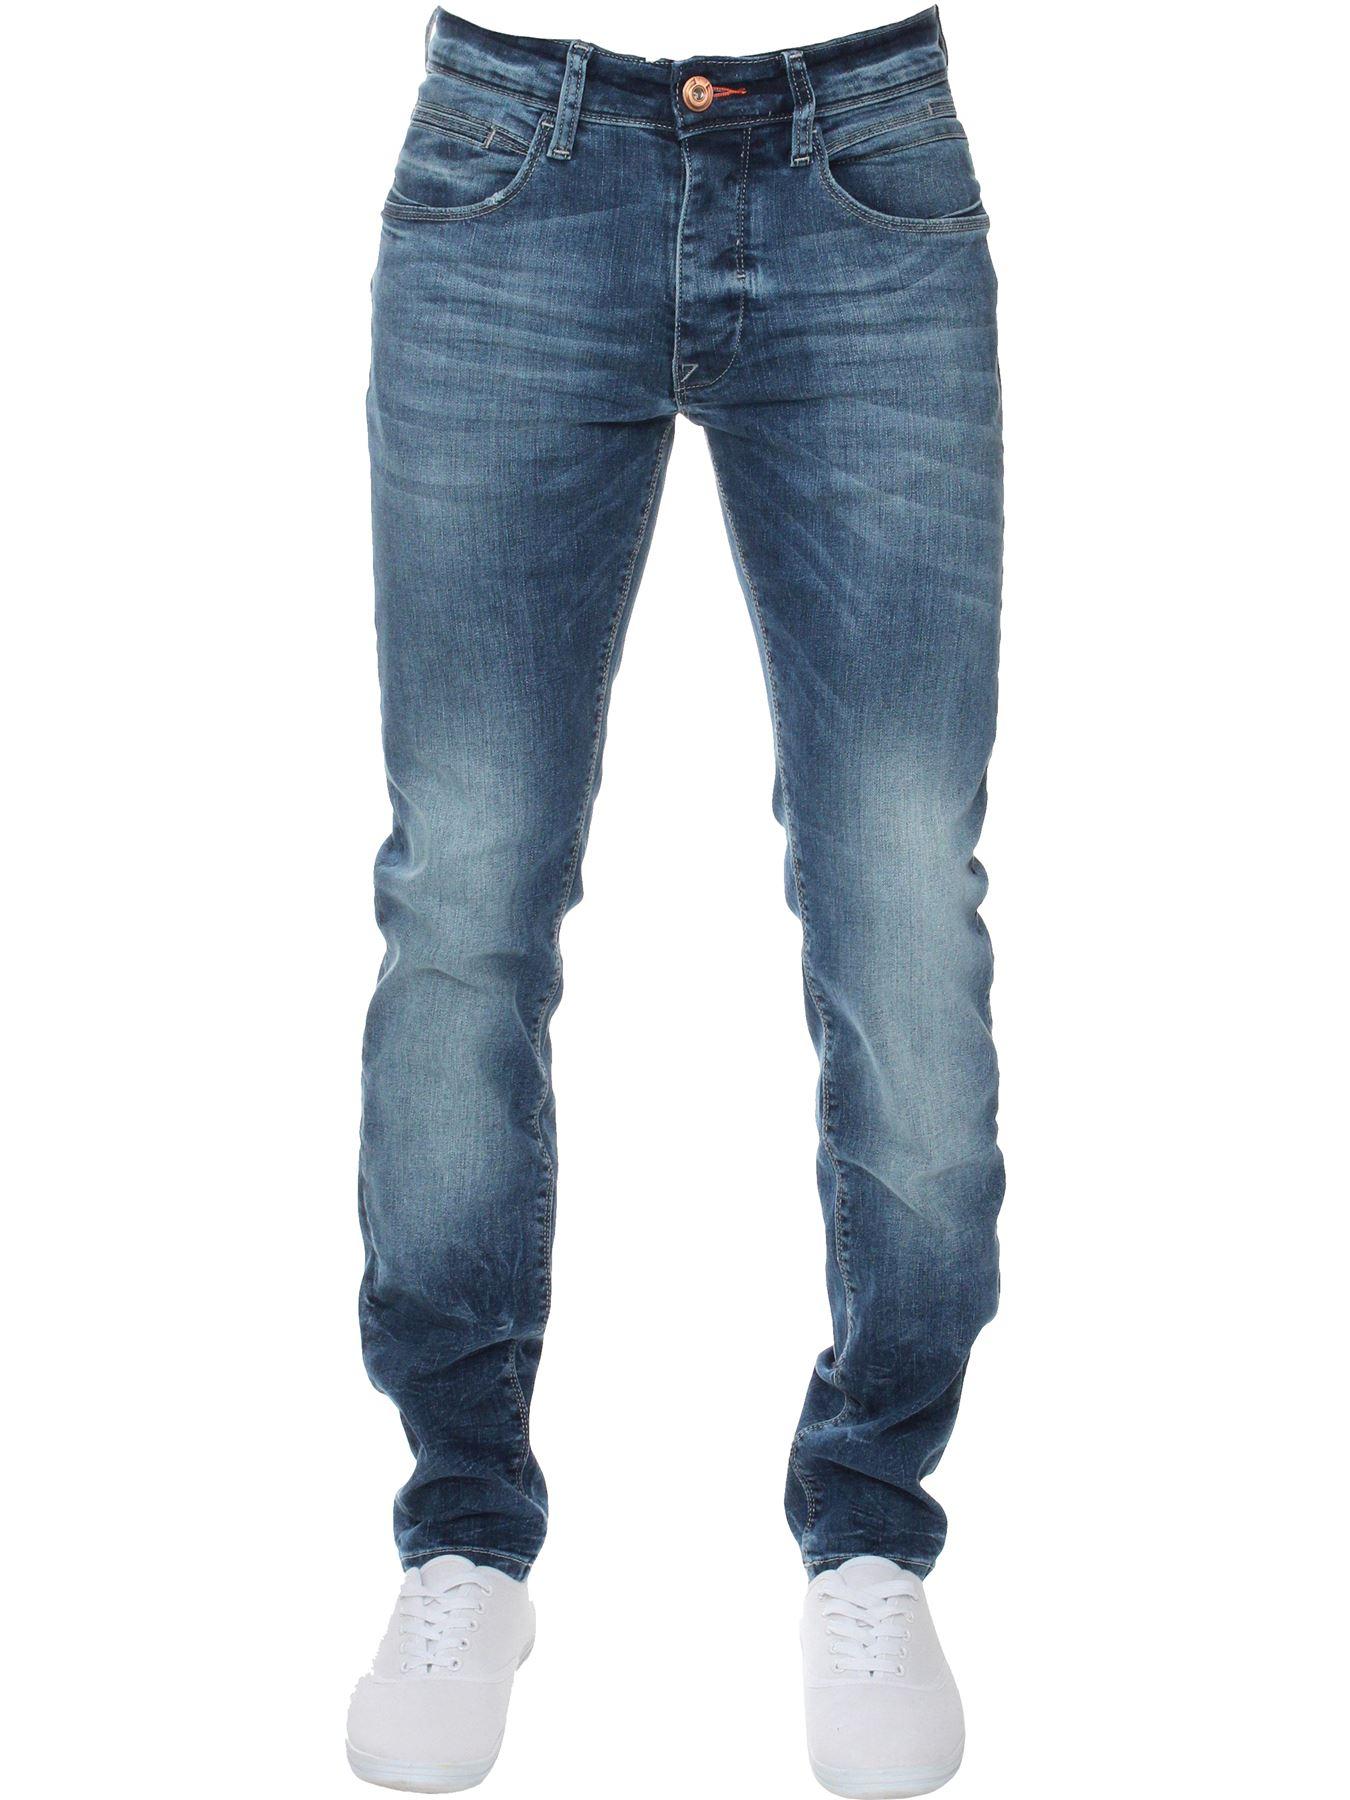 New Eto Mens Skinny Jeans Hyper Stretch Reflex Denim Super Slim Fit All Waists